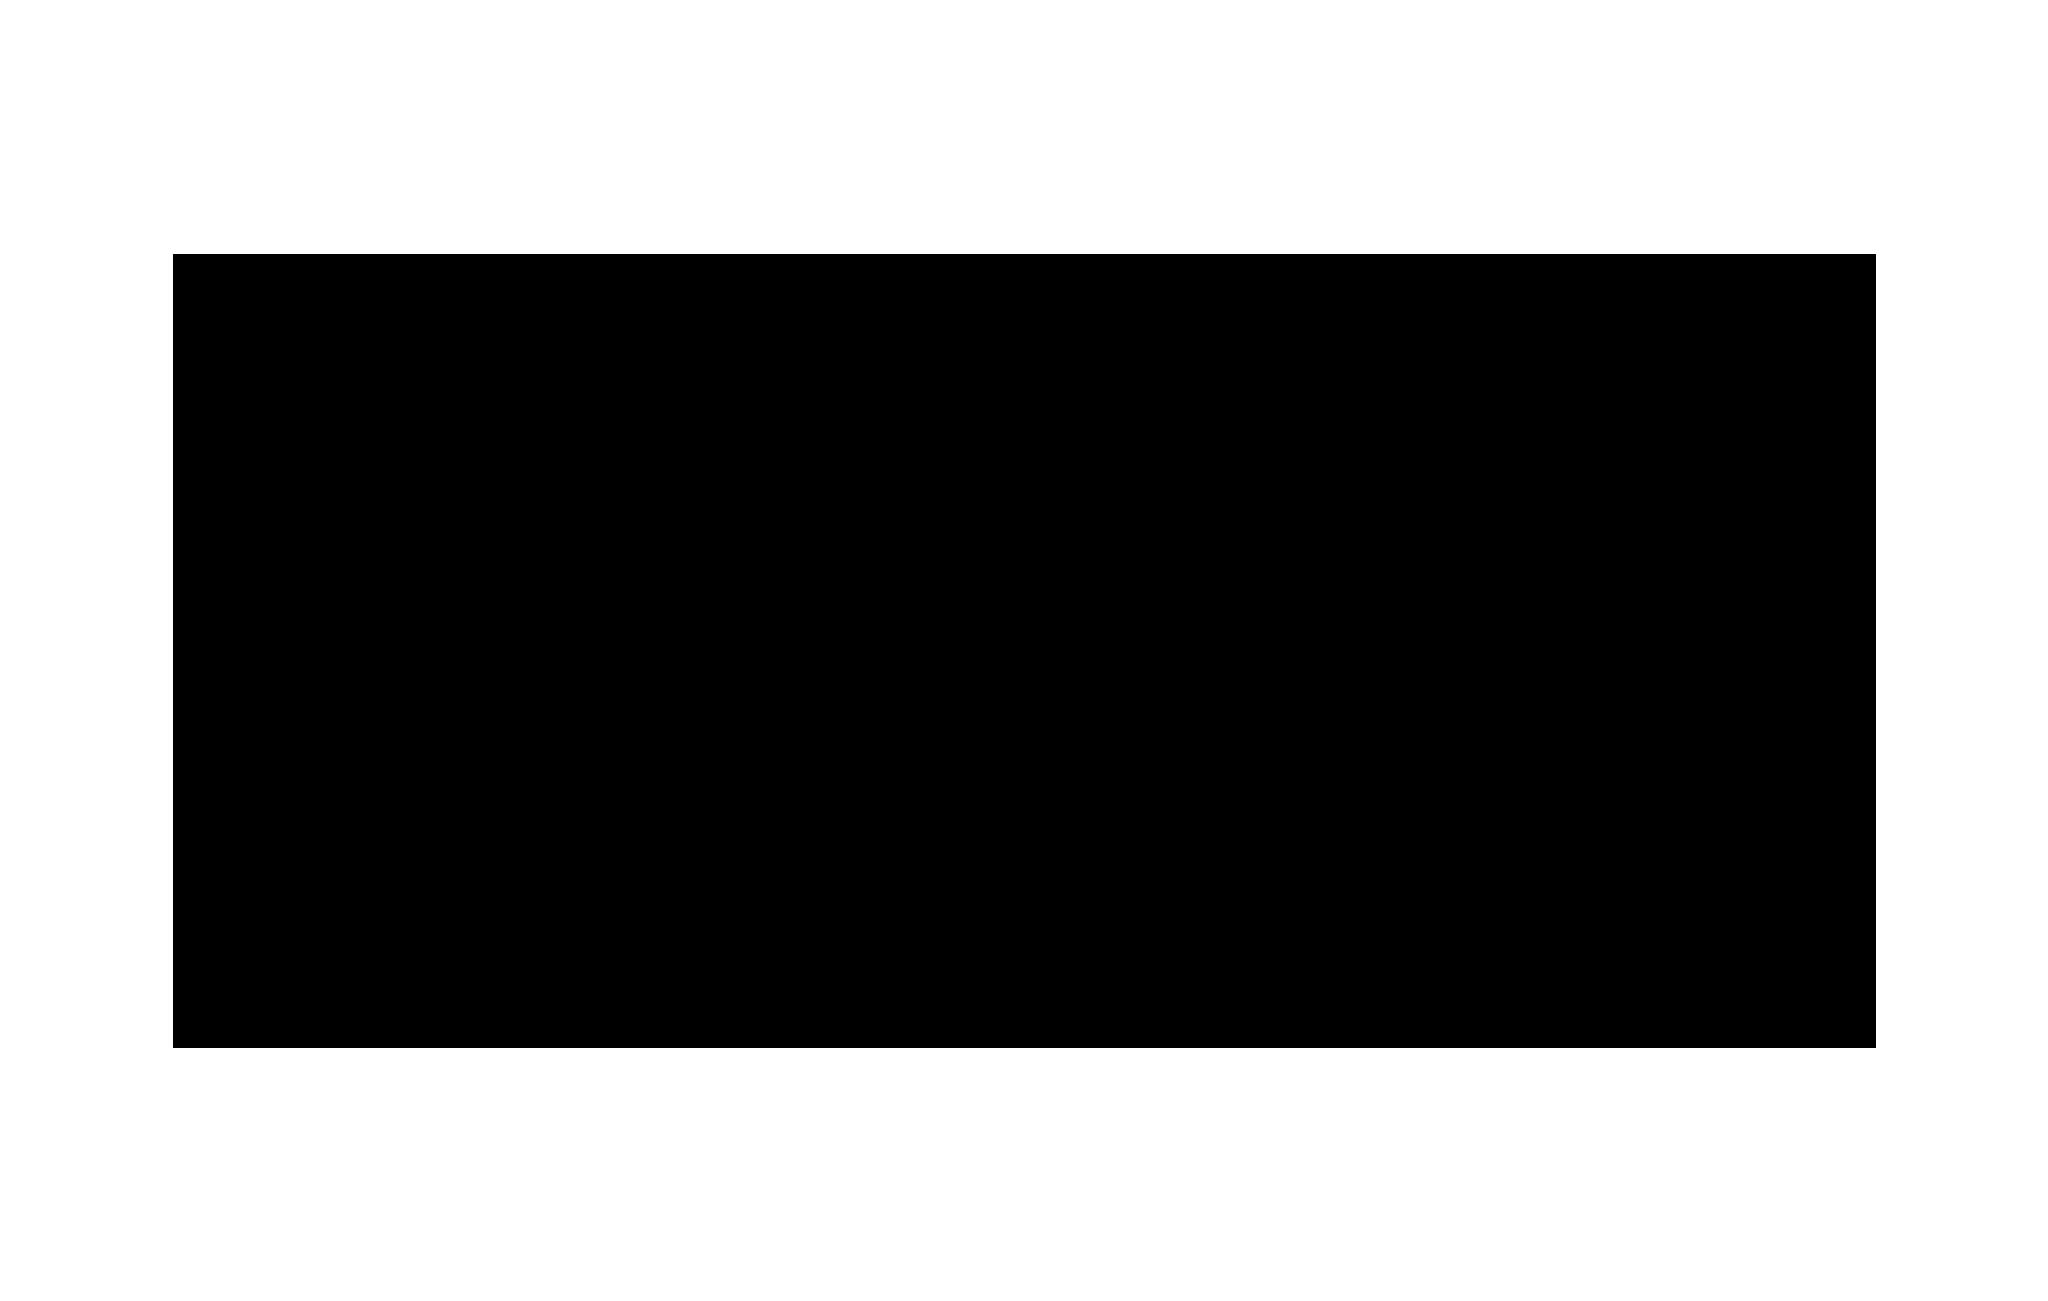 Tan natural logo